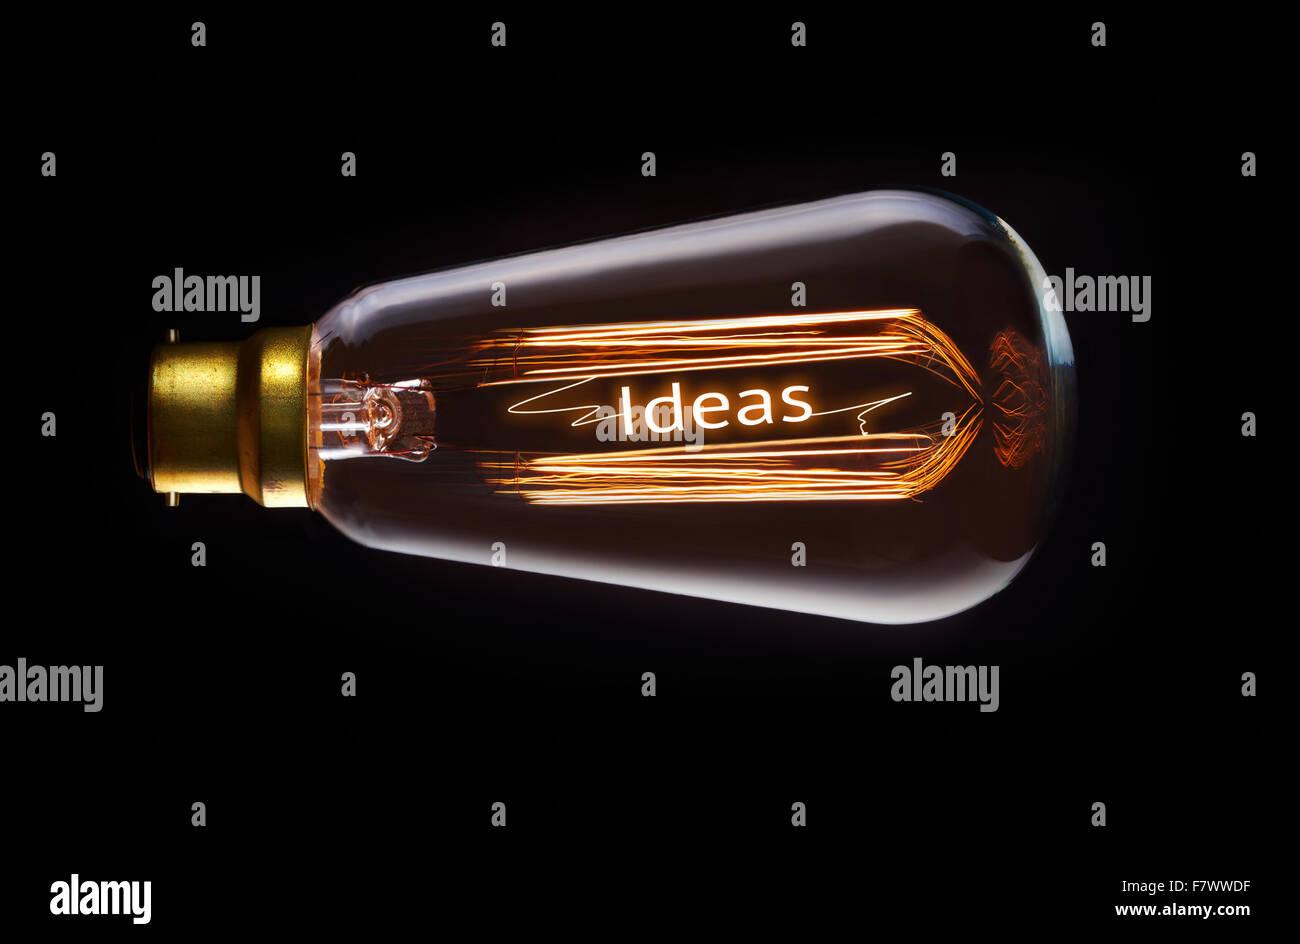 Ideas concept in a filament lightbulb. Stock Photo